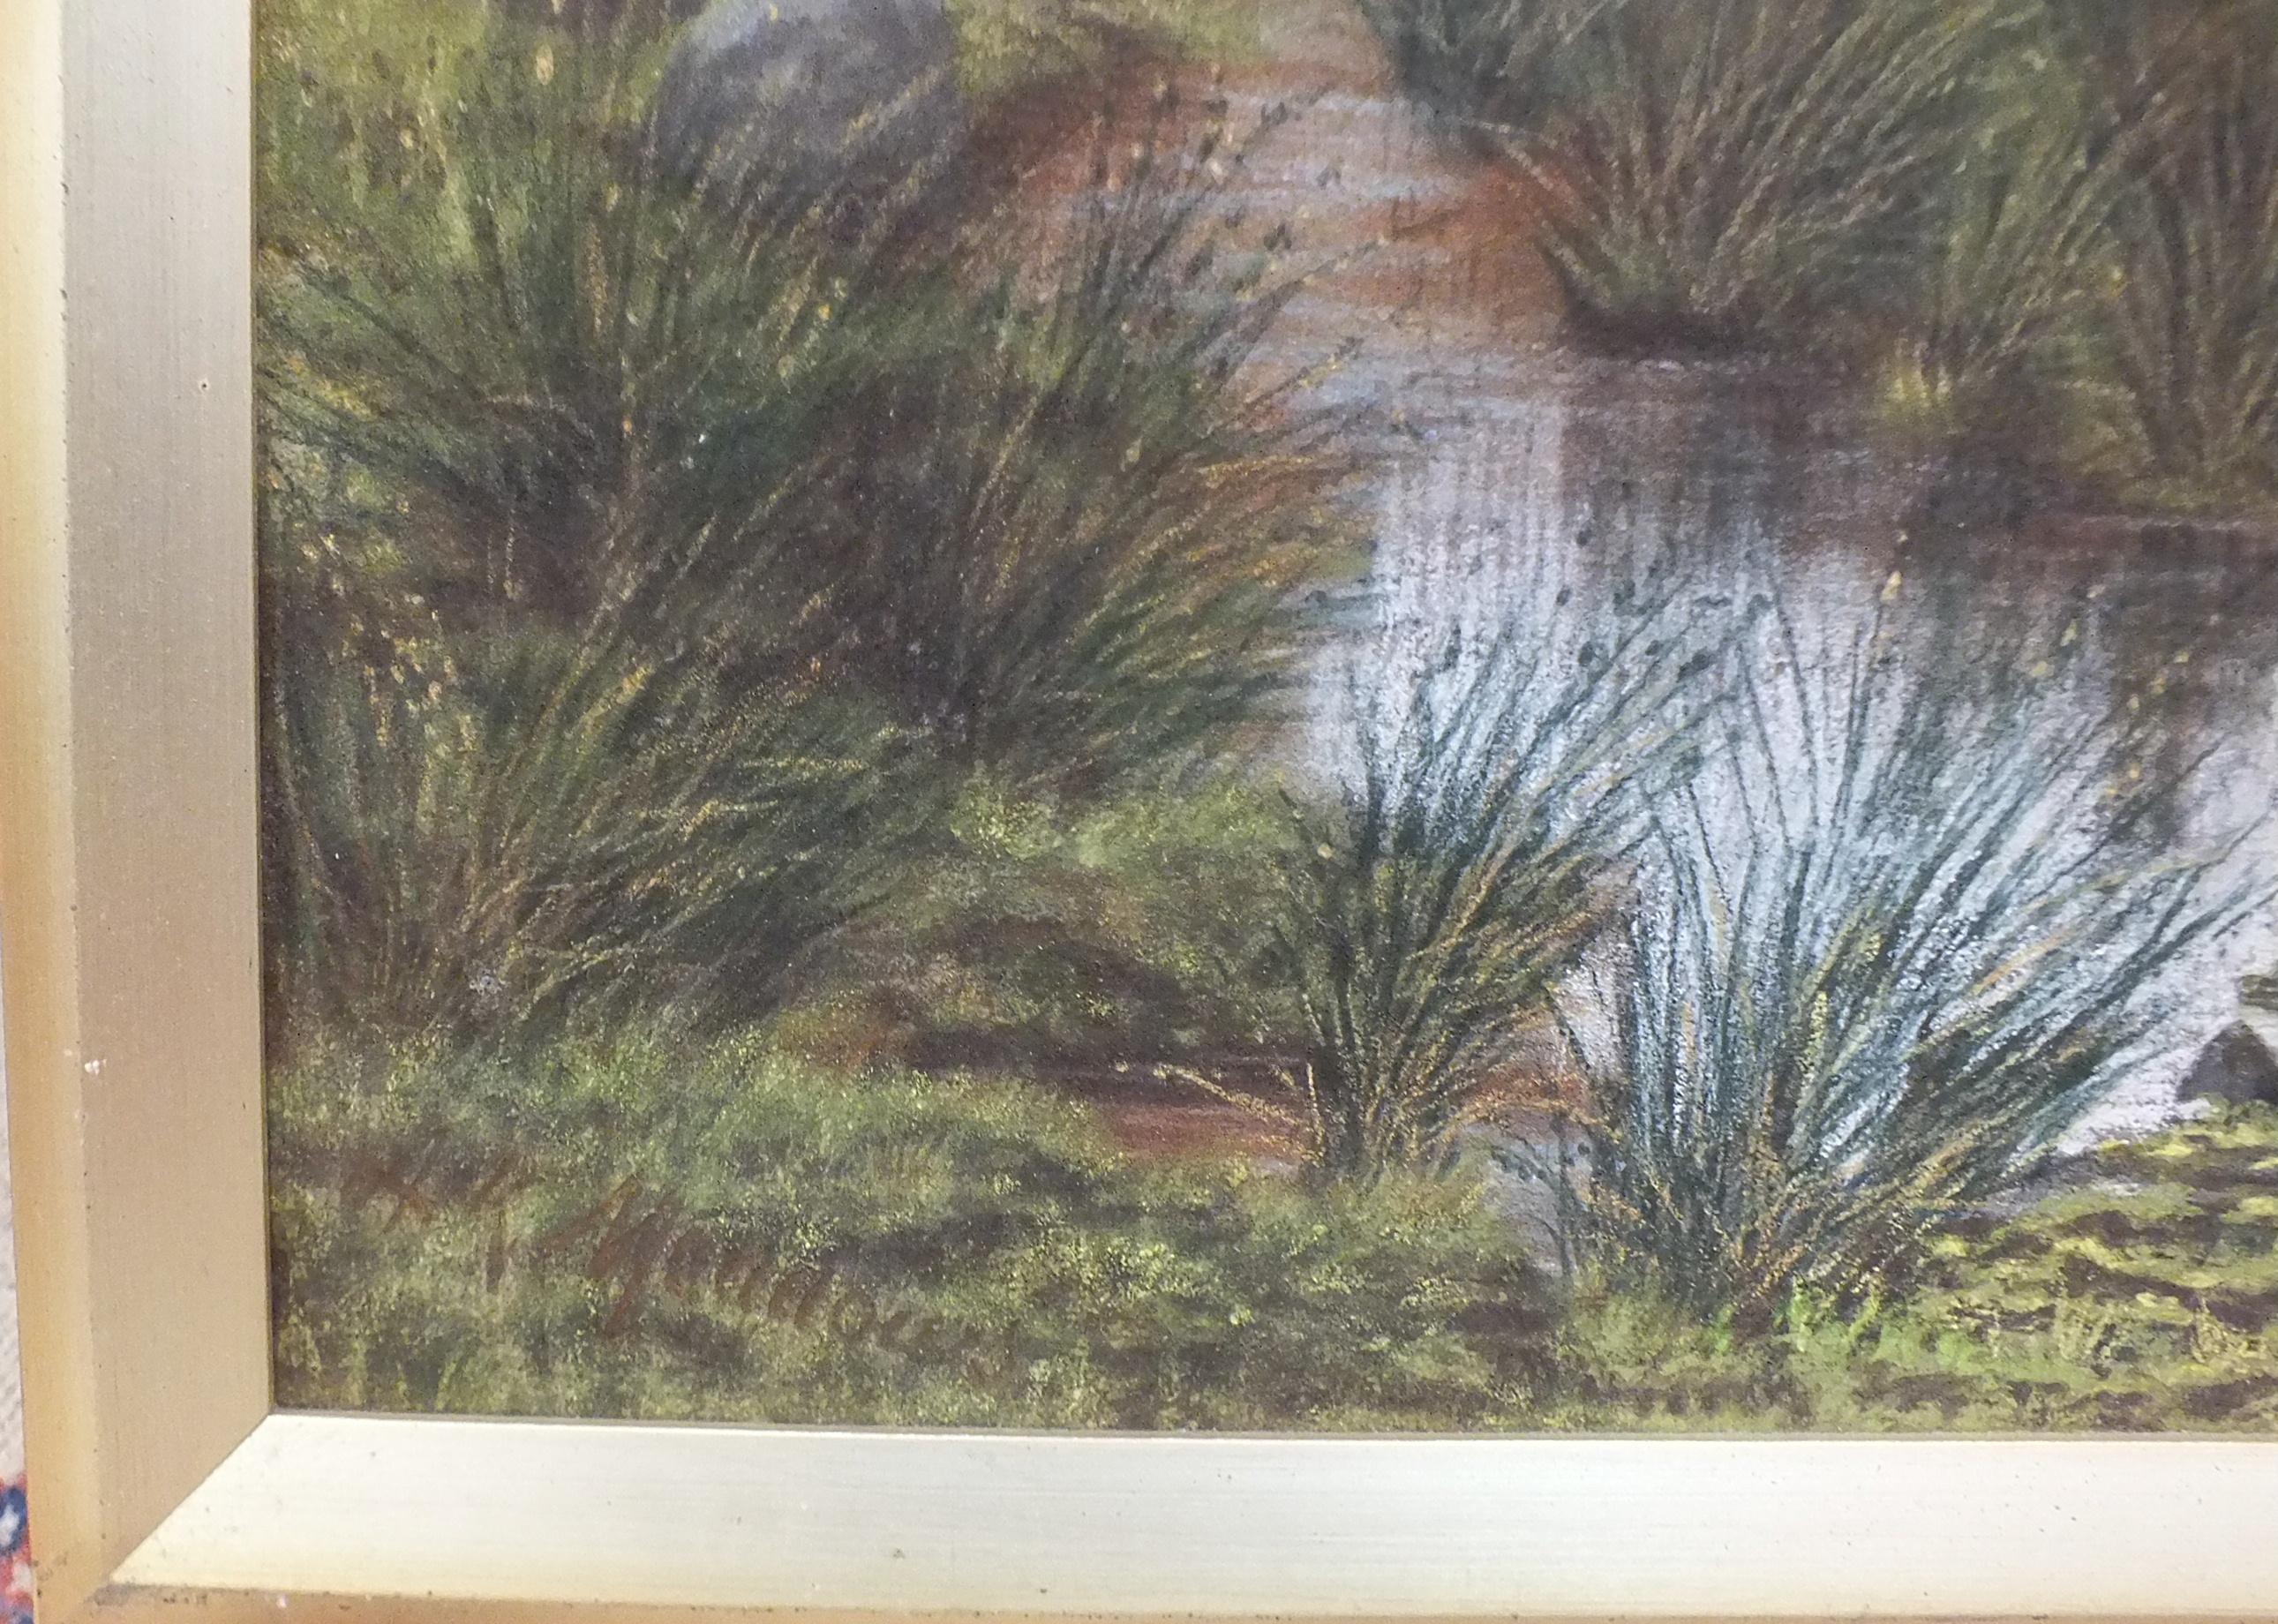 A K Meadows (19th/20th century), 'Looking towards Widgery Cross, Dartmoor', pastel, signed, 60 x - Image 4 of 4